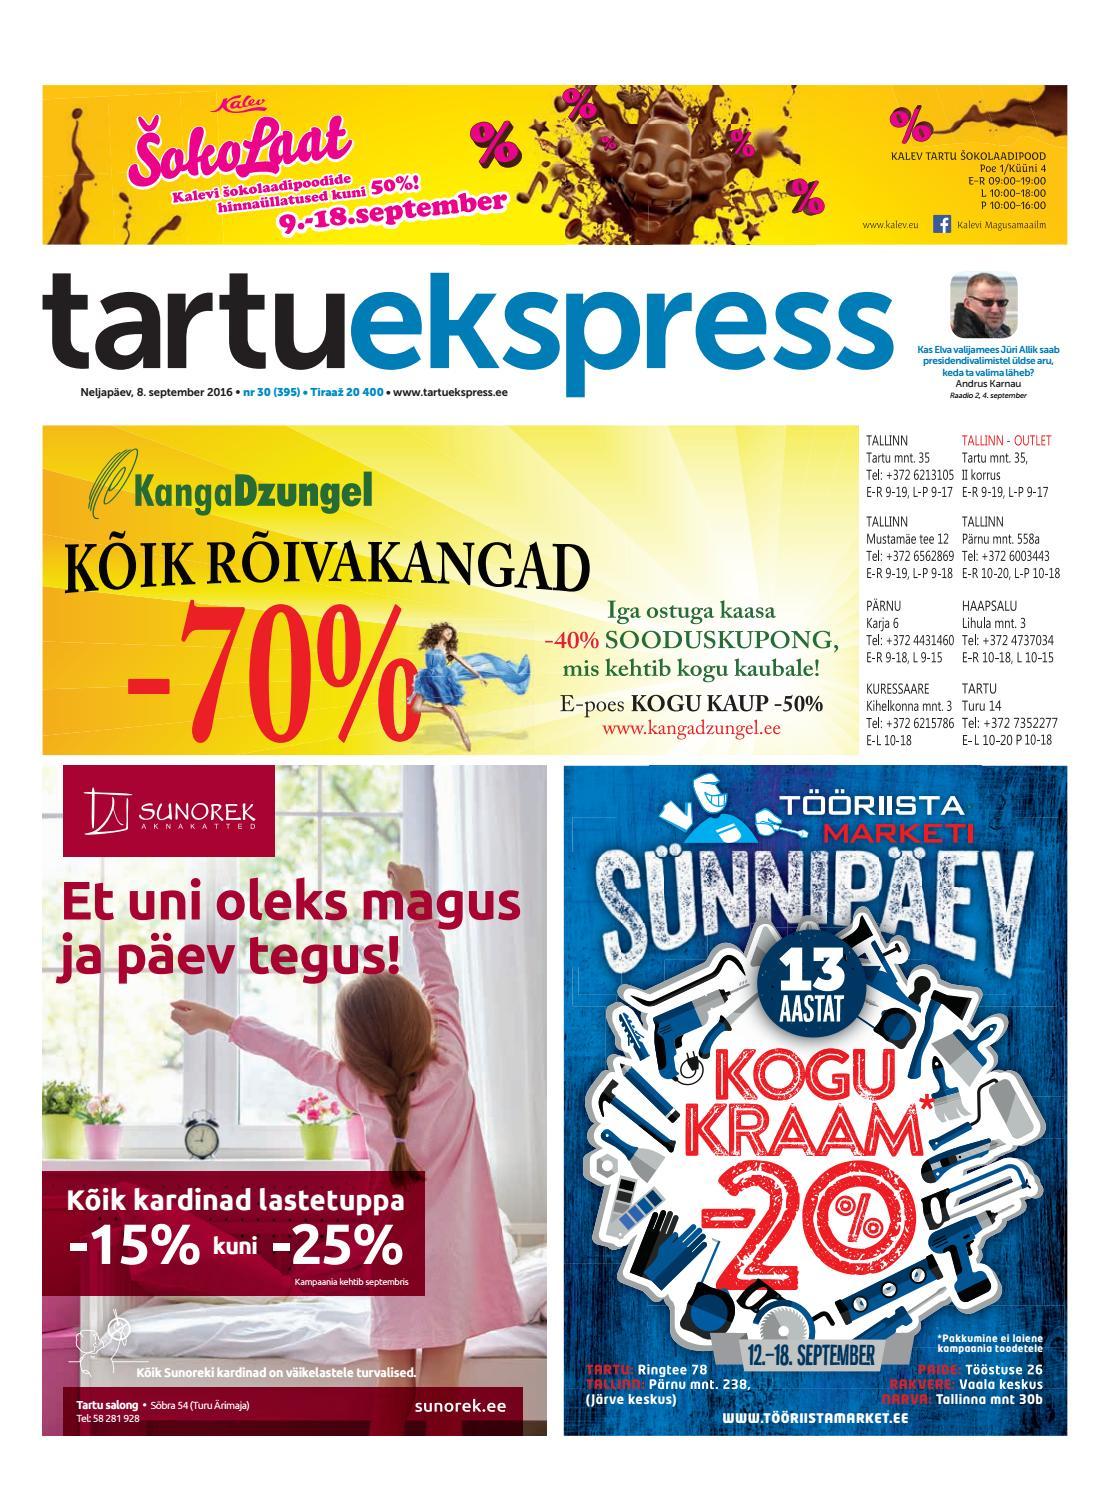 c4c348a2d04 Tartu Ekspress, 8.09.2016 by Tartu Ekspress - issuu